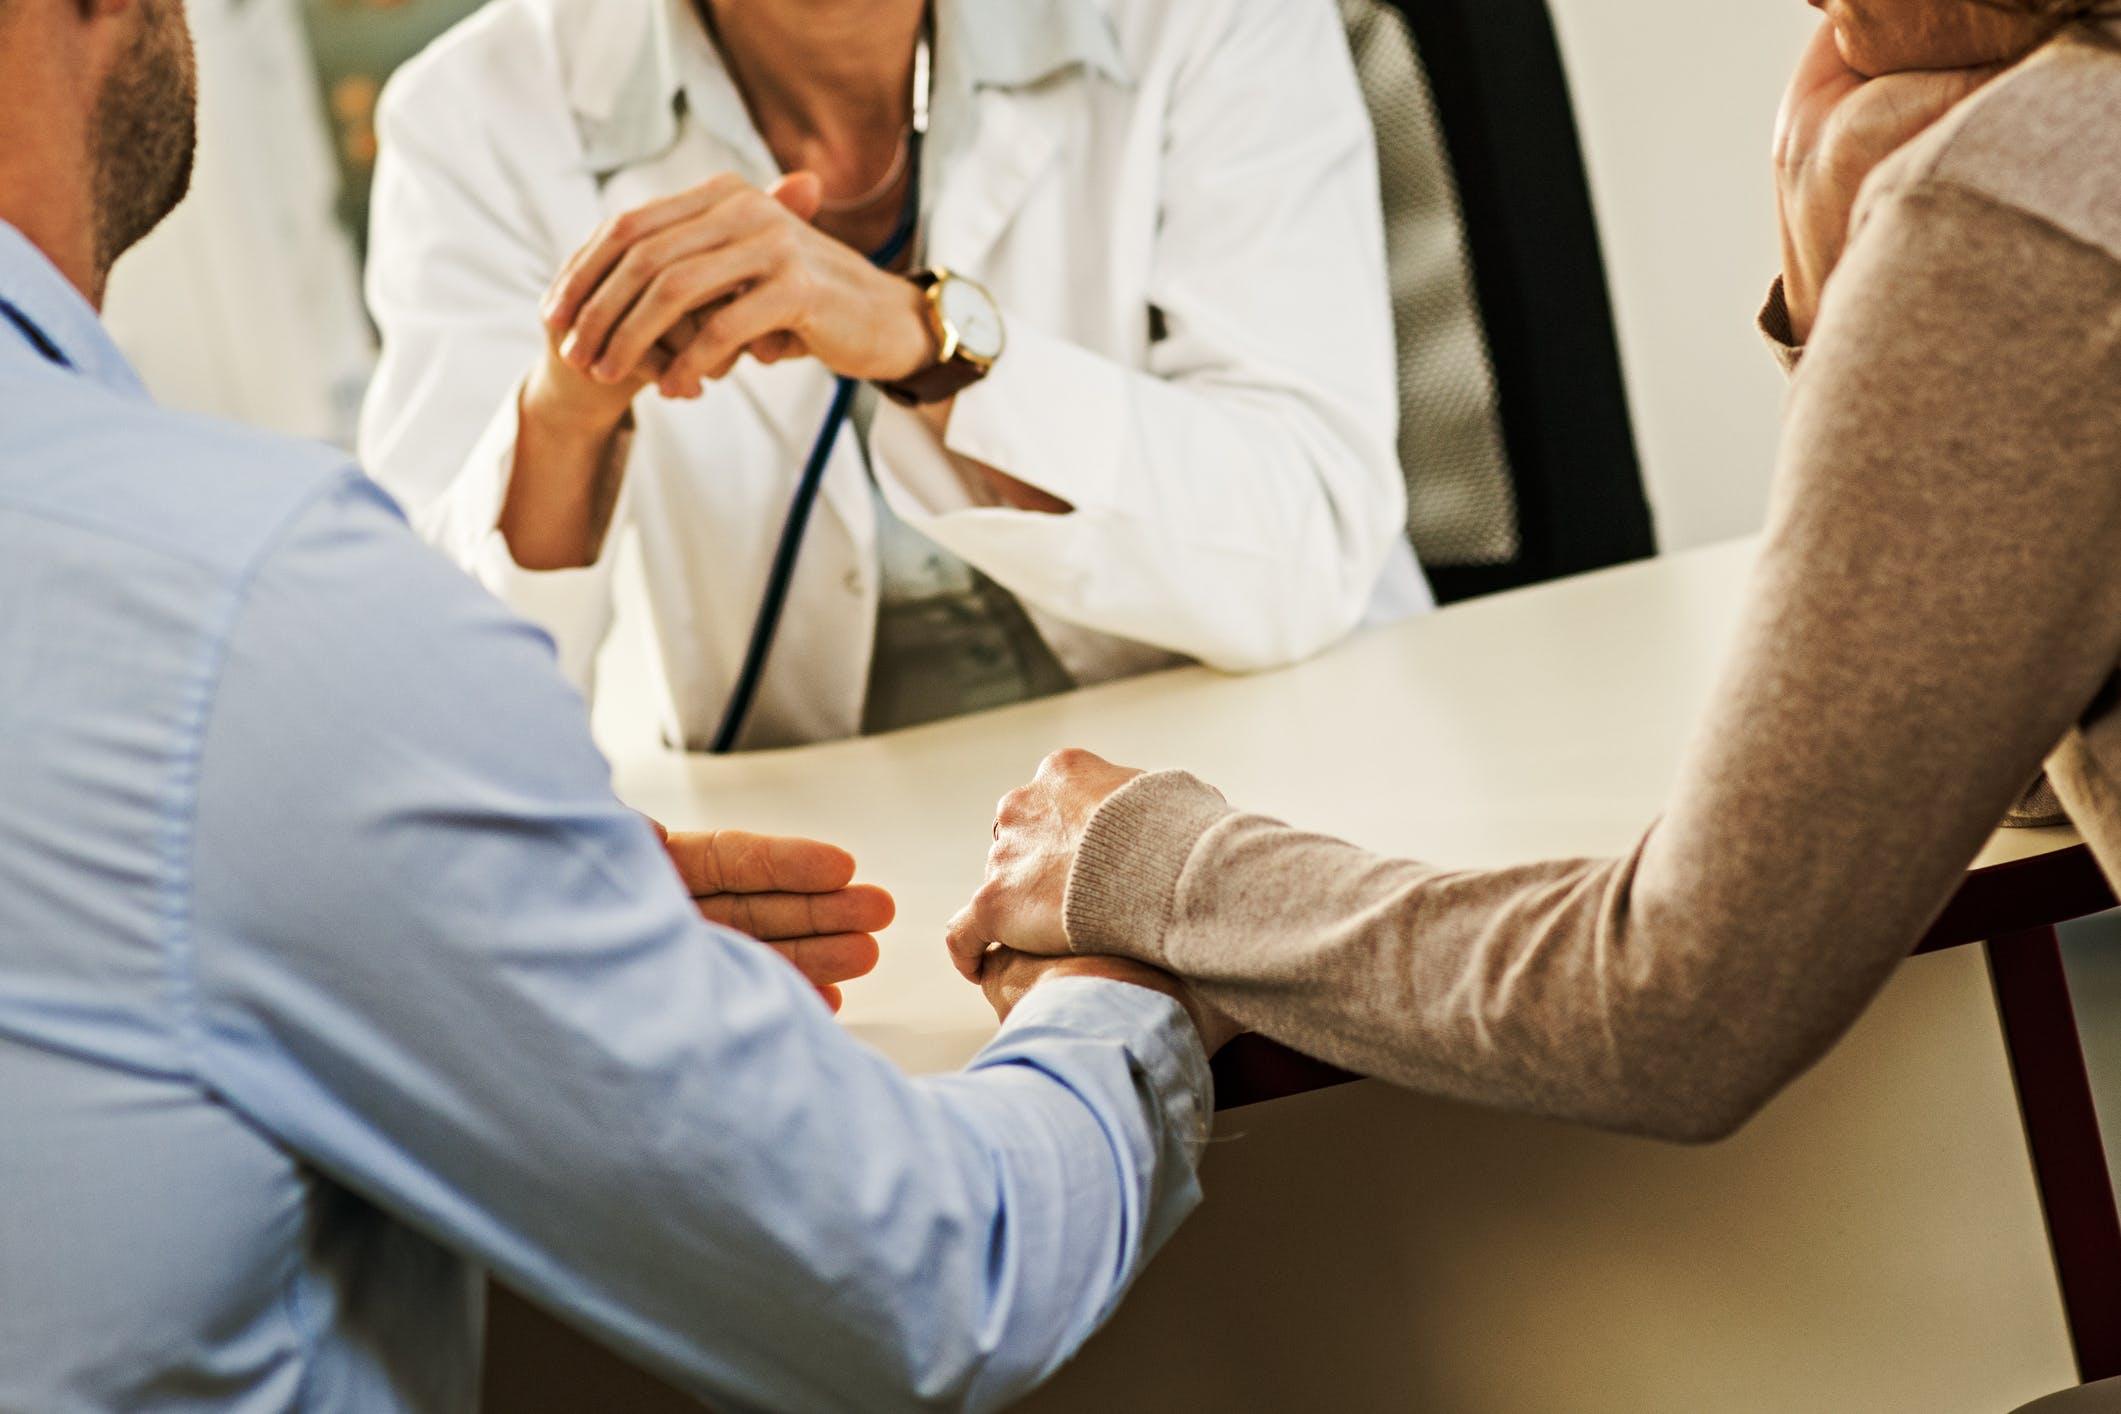 couple se tenant la main discute avec corps medical